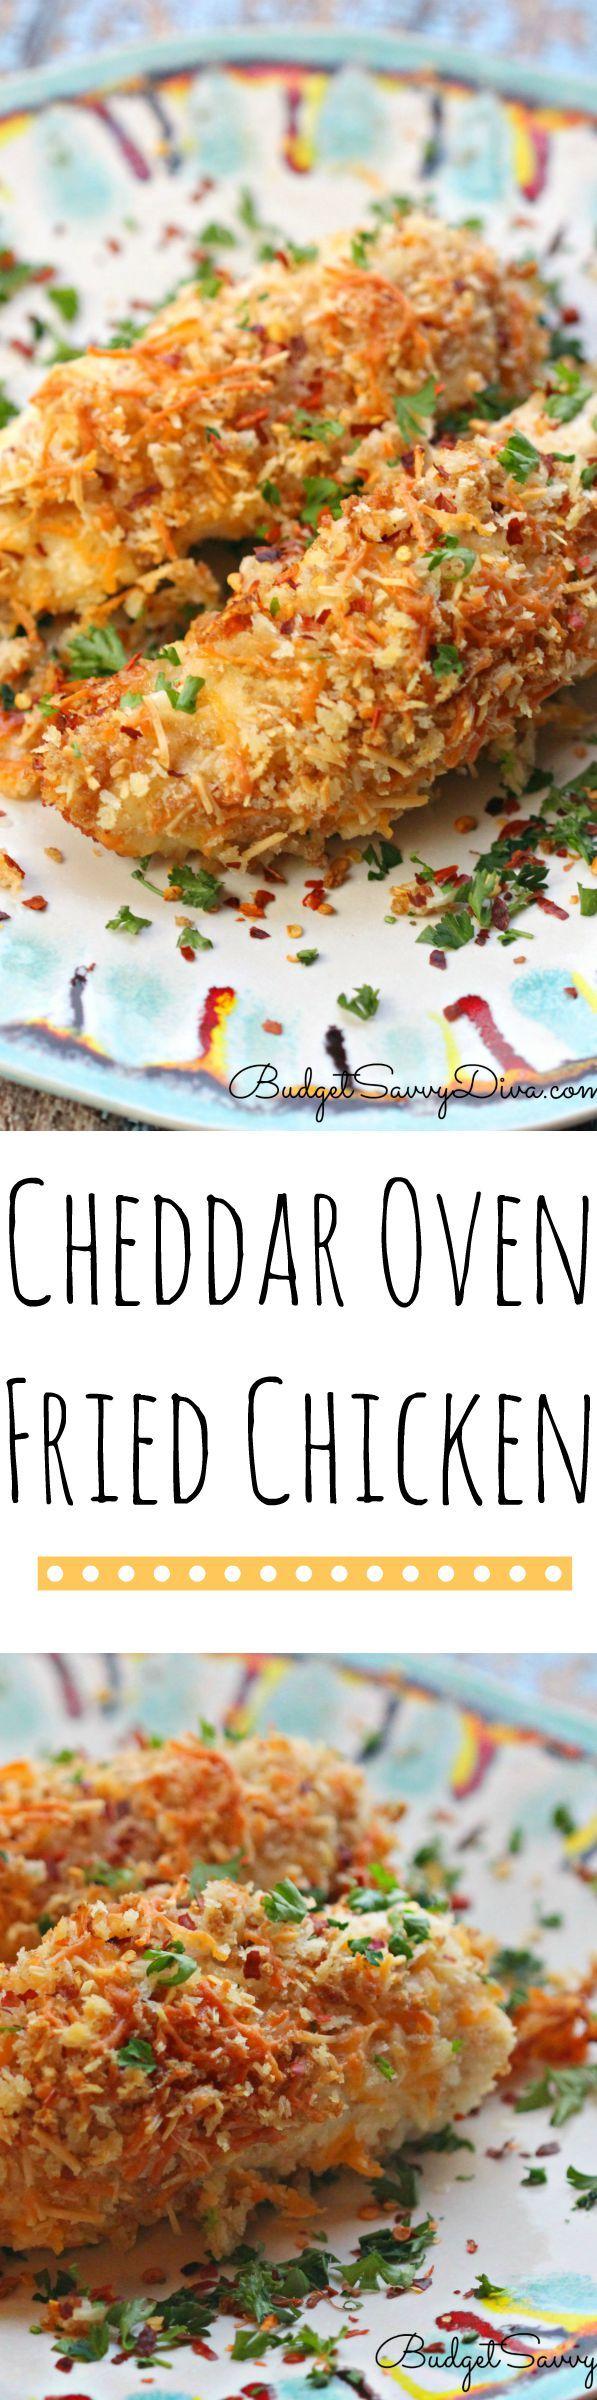 Cheddar Oven Fried Chicken Recipe